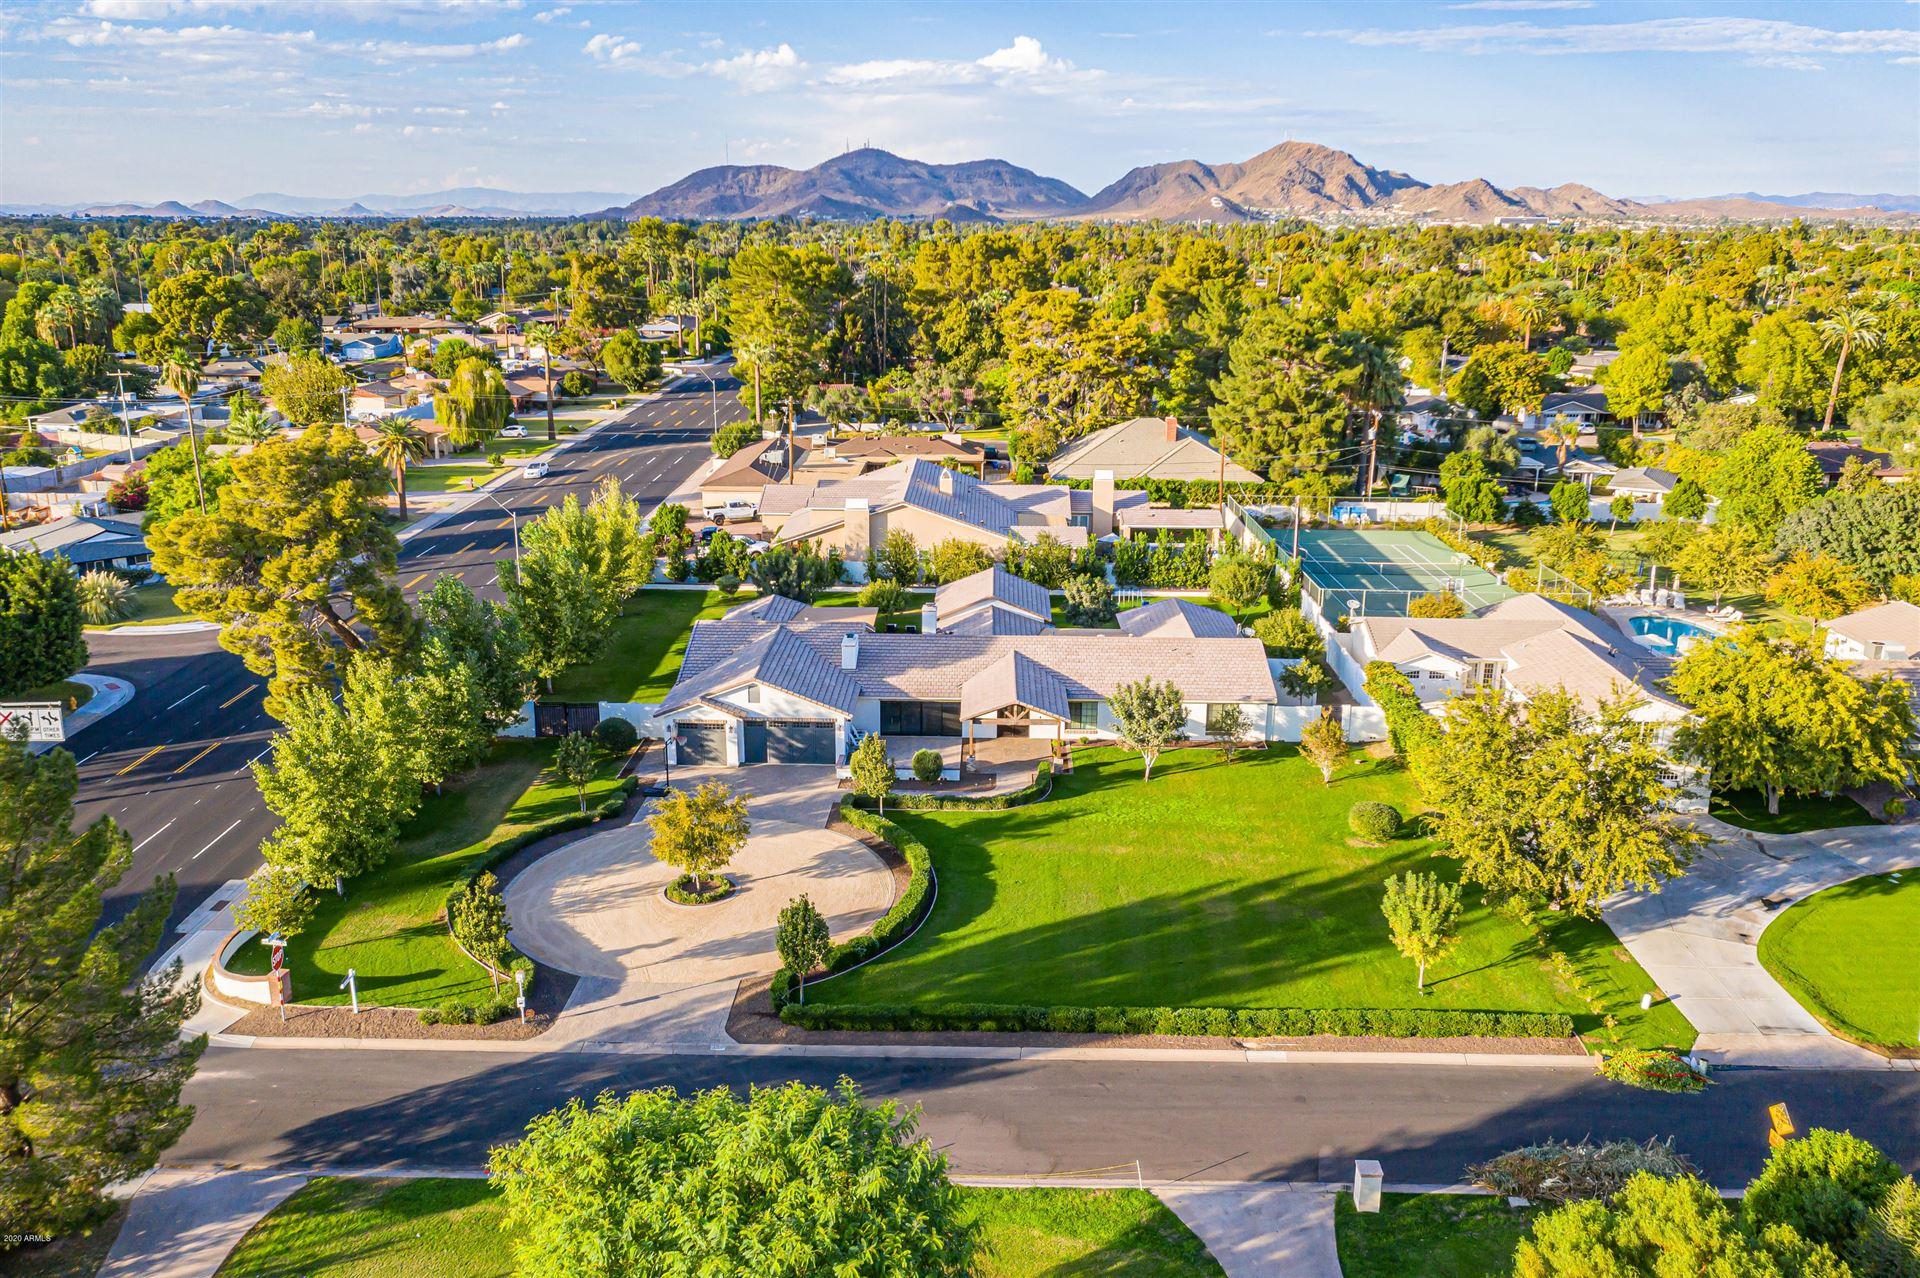 610 W NORTHVIEW Avenue, Phoenix, AZ 85021 - MLS#: 6155045